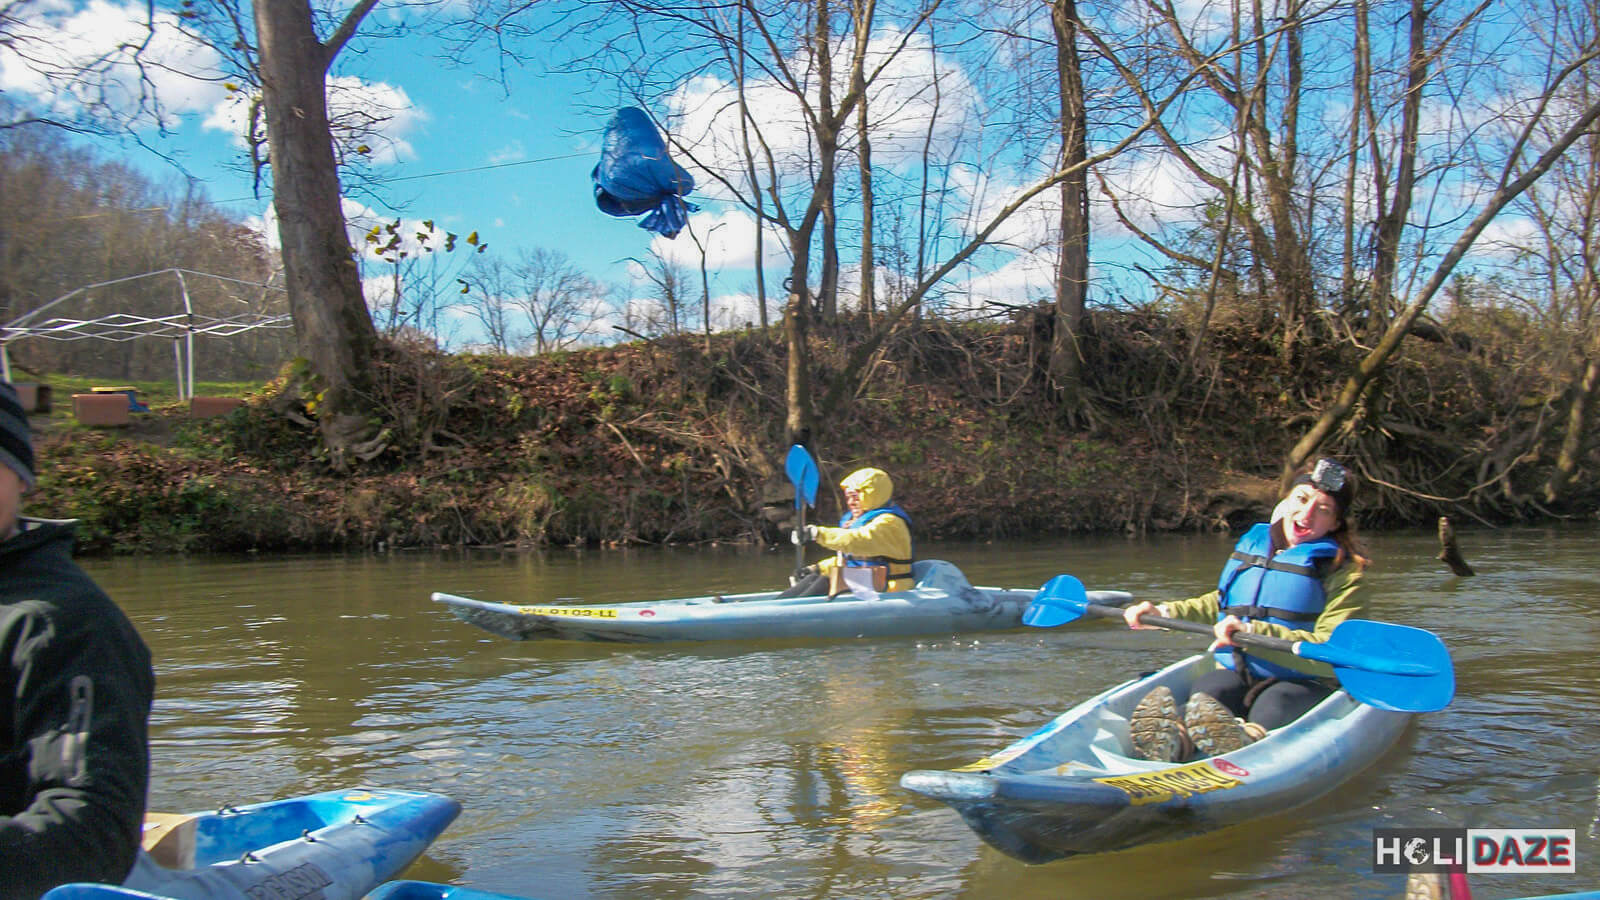 Kayaking the Hocking River in Hocking Hills, Ohio